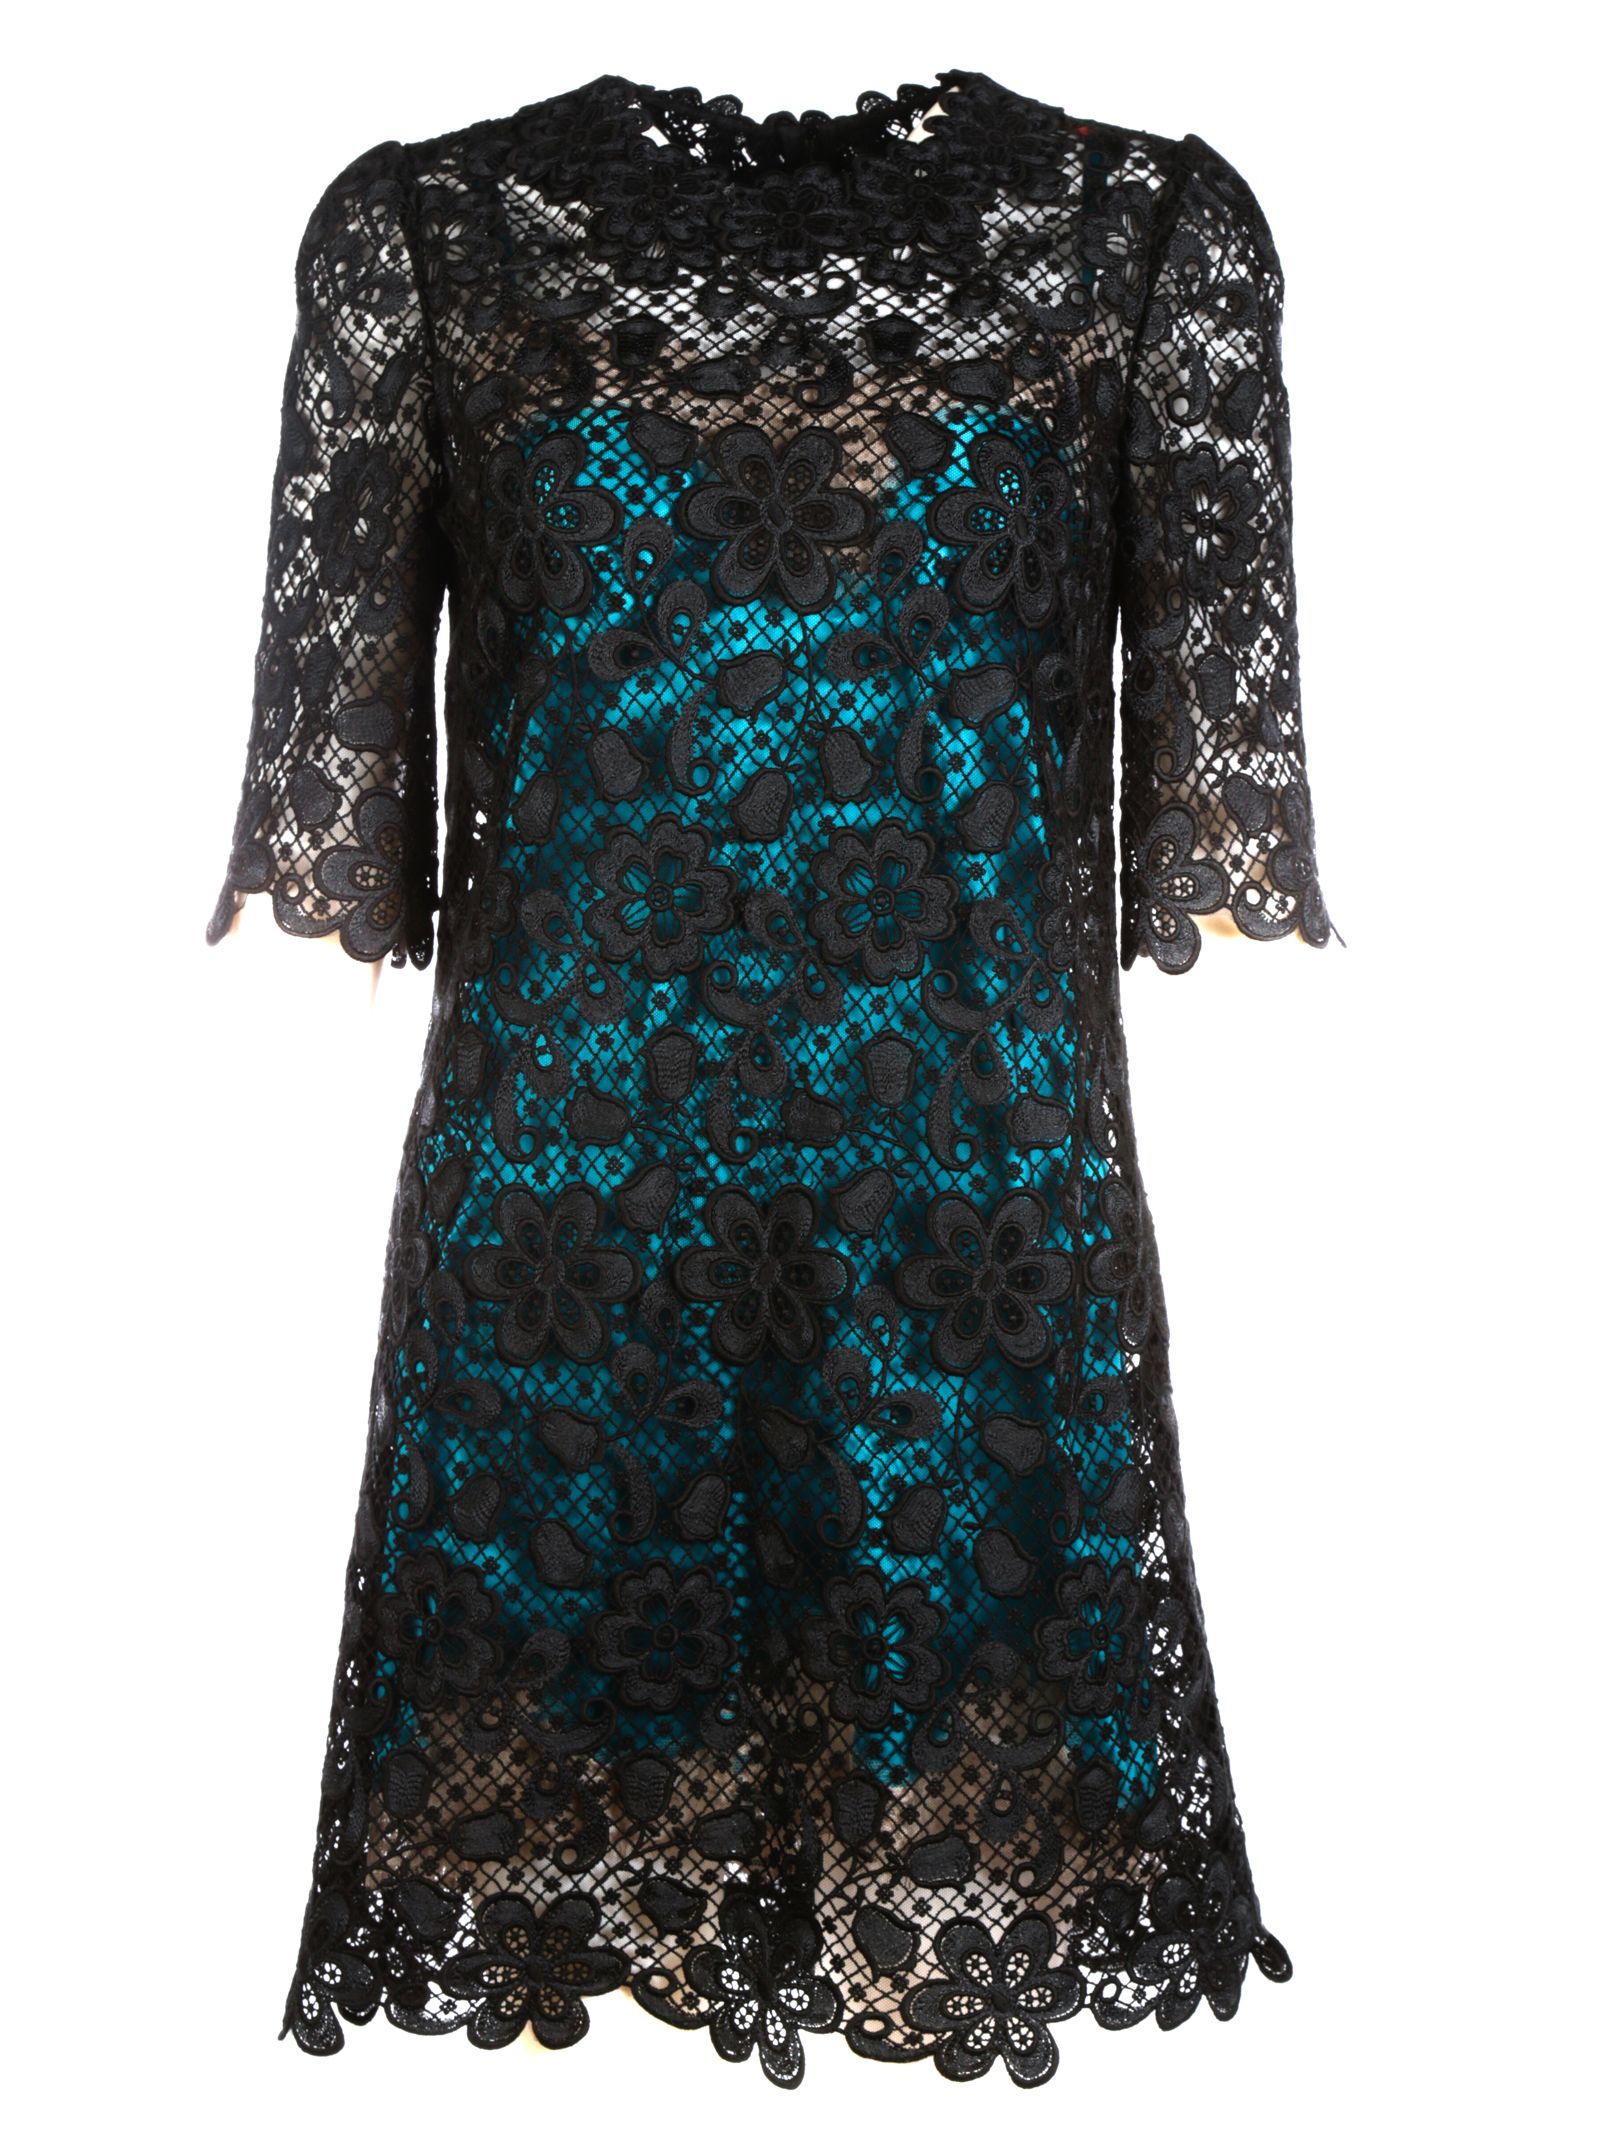 Dolce & Gabbana Contrast Lining Lace Dress